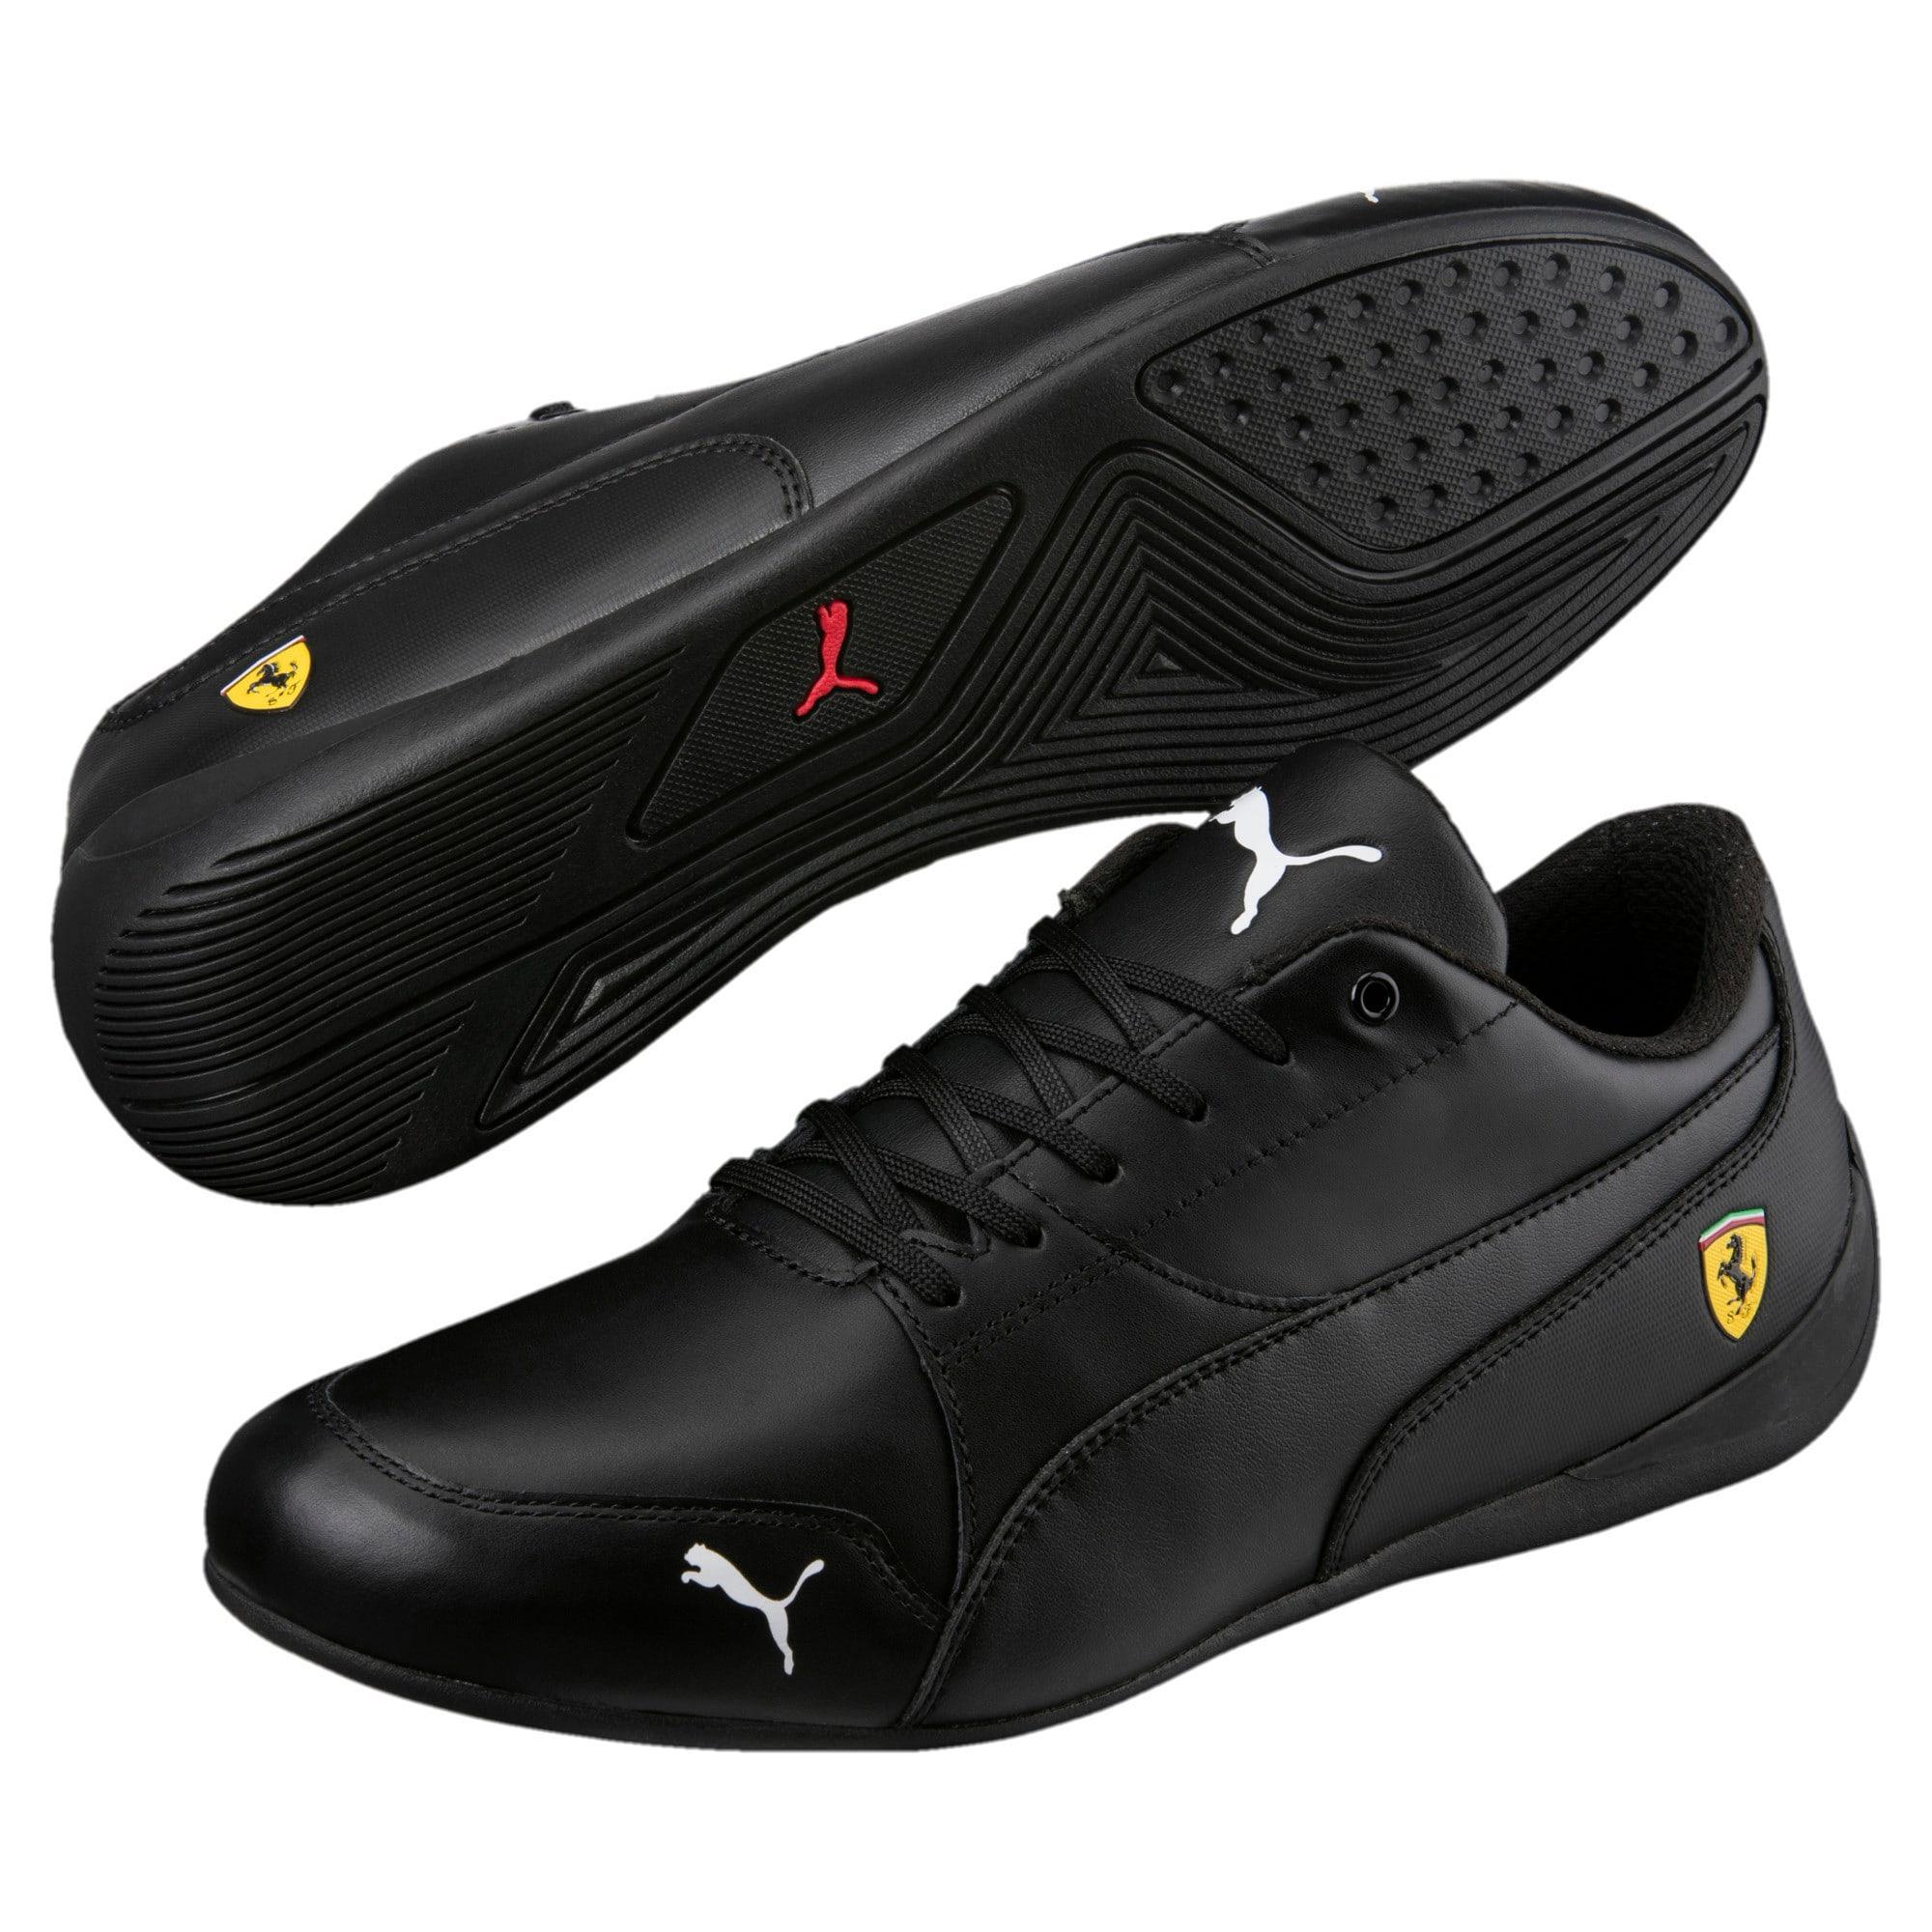 Thumbnail 6 of Ferrari Drift Cat 7 Trainers, Puma Black-Puma Black, medium-IND